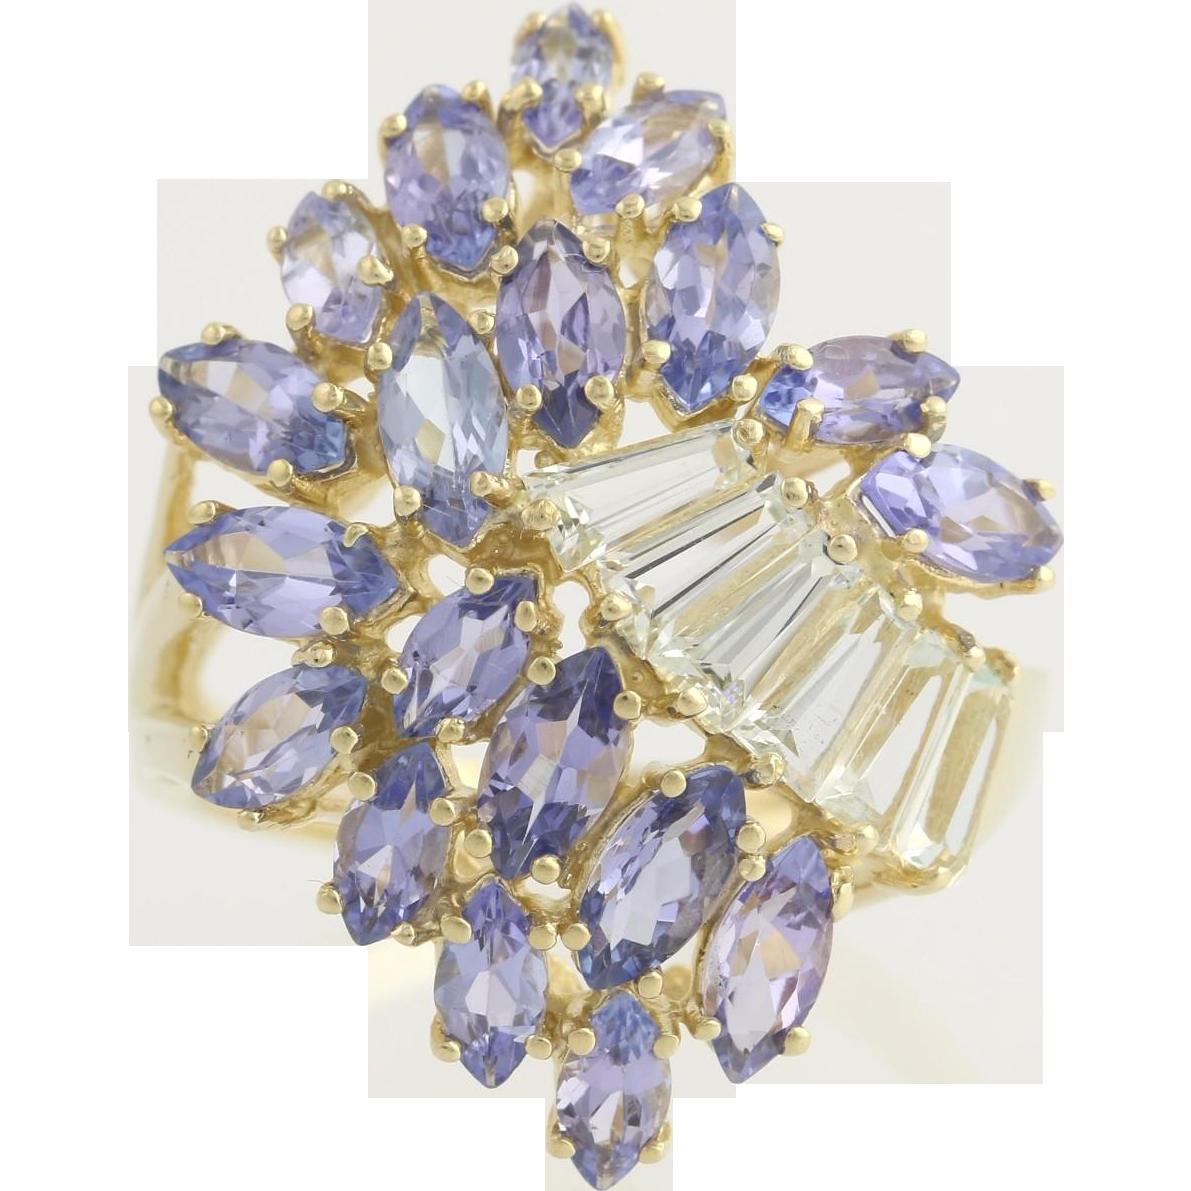 Tanzanite & Aquamarine Cluster Cocktail Ring - 14k Yellow Gold Genuine 3.26ctw